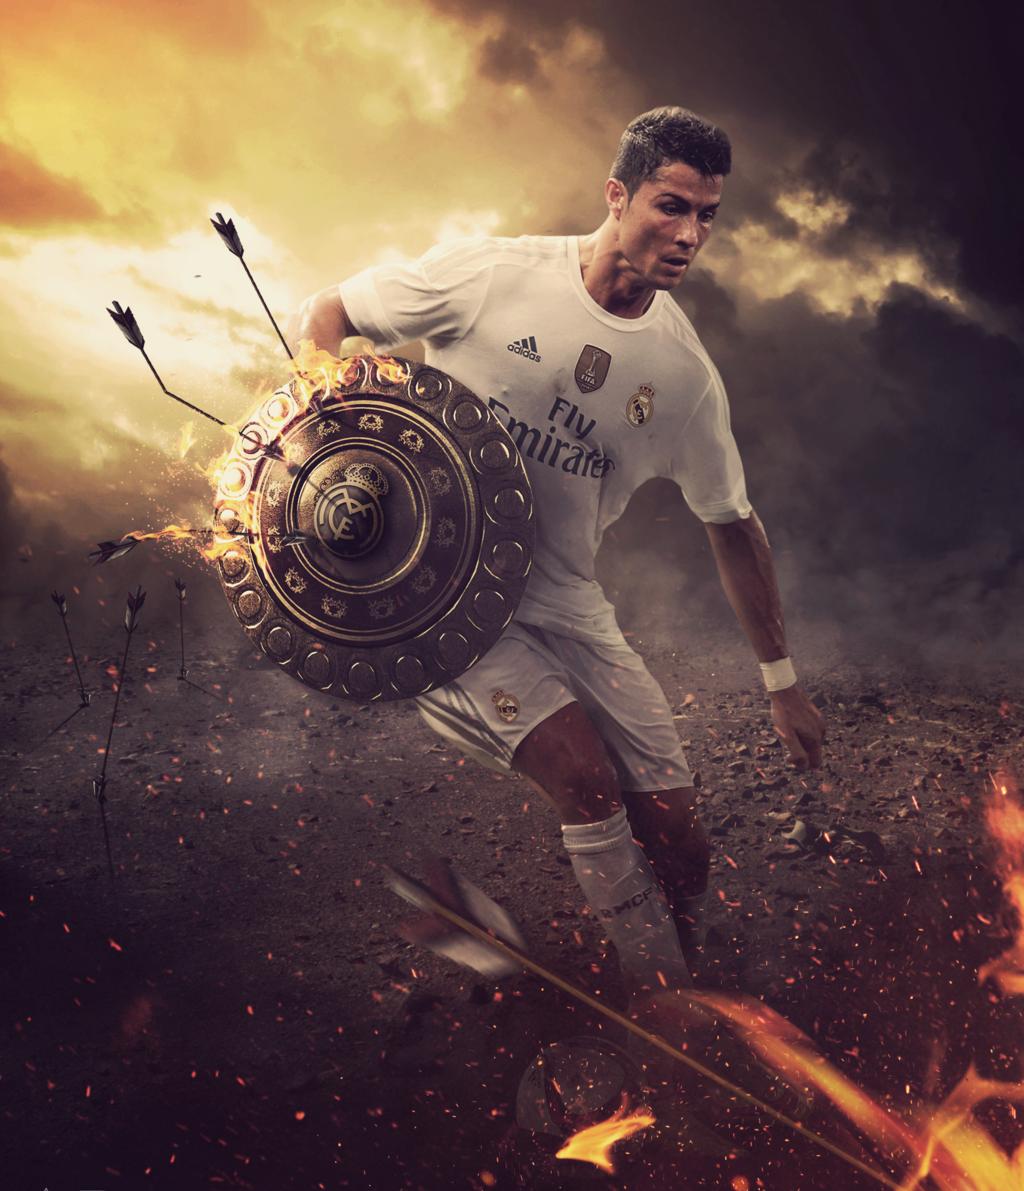 Cristiano Ronaldo - The Warrior